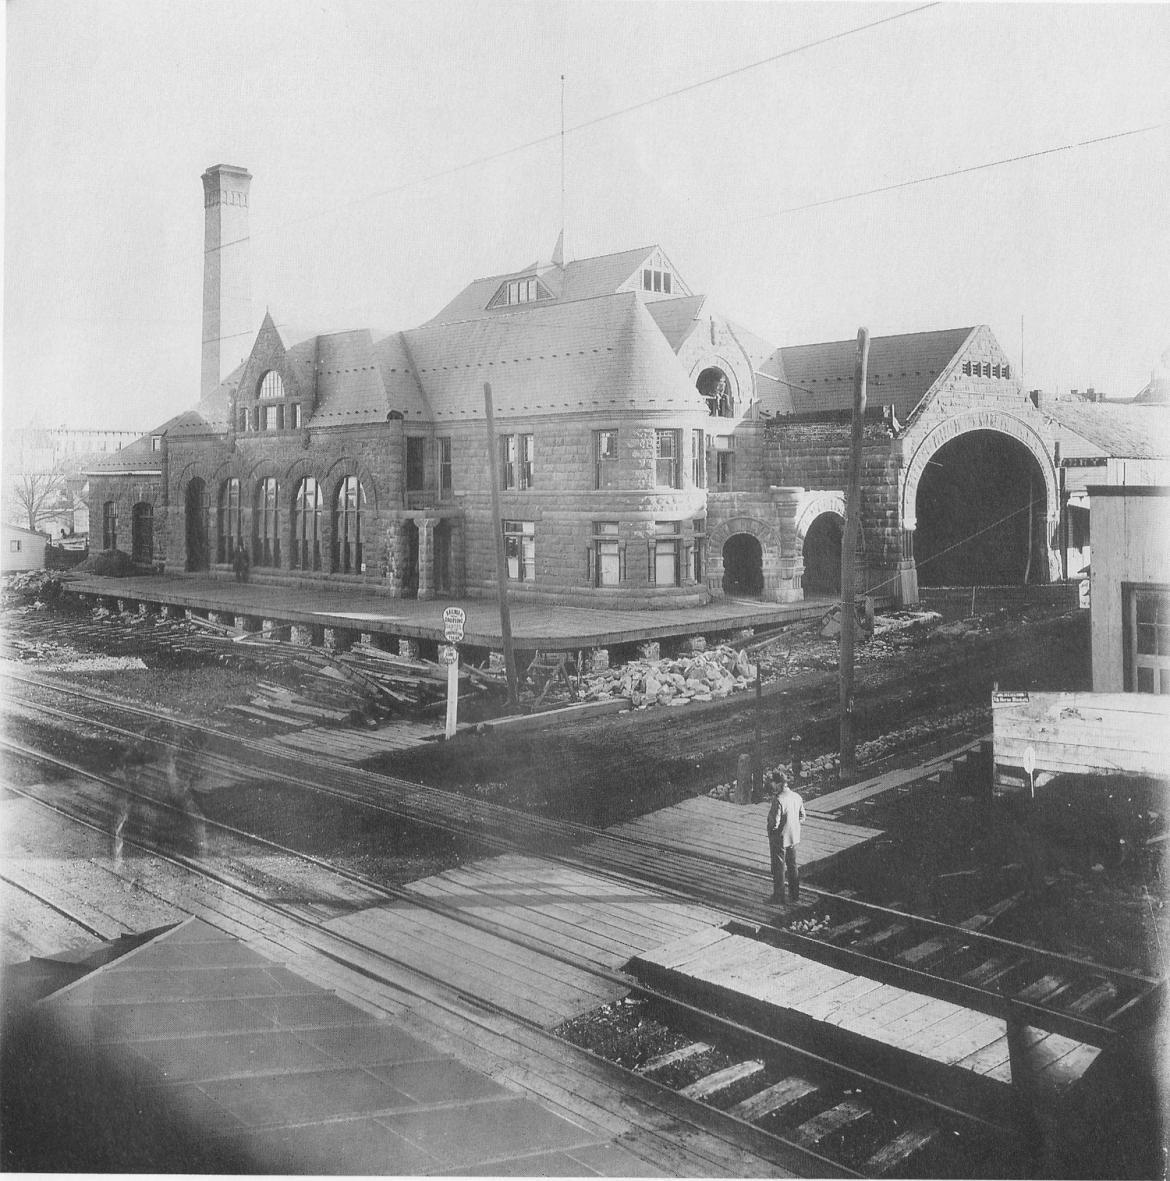 Gettysburg electric powerhouse